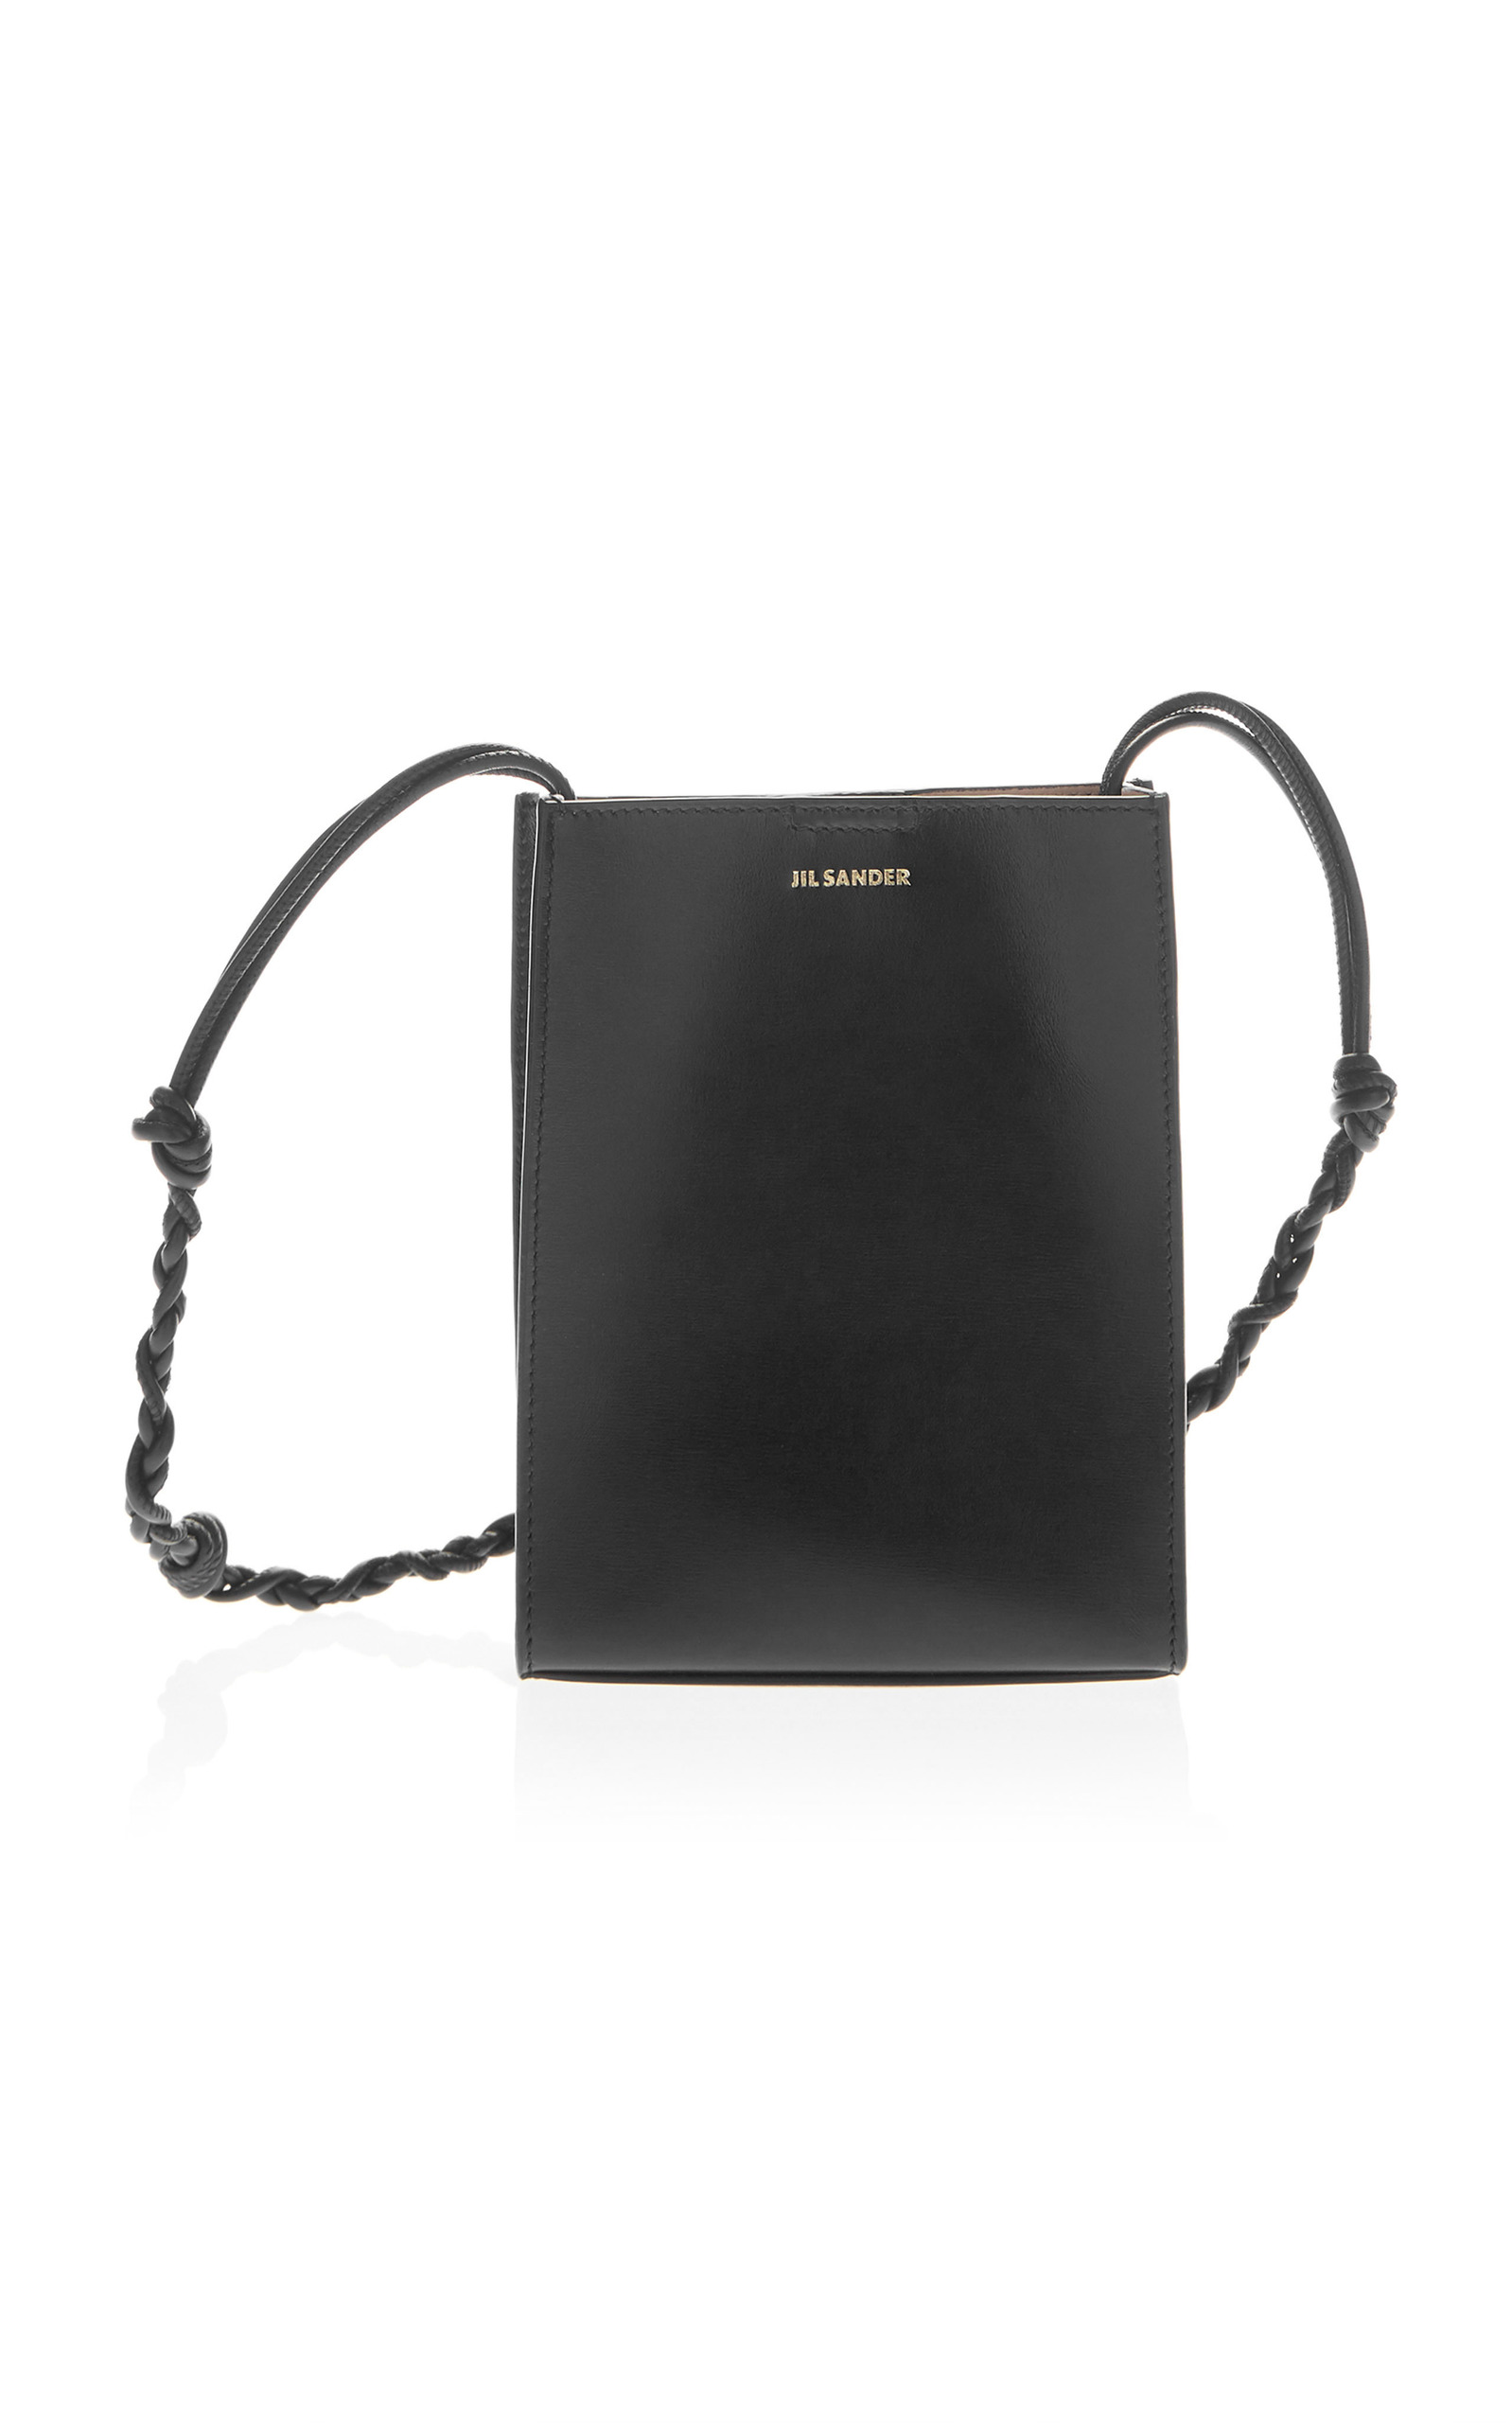 Discount Original Jil Sander Medium Tangle Satchel Bag Outlet Affordable Nicekicks Sale Online Shop Shopping Online With Mastercard SqwGmPUD